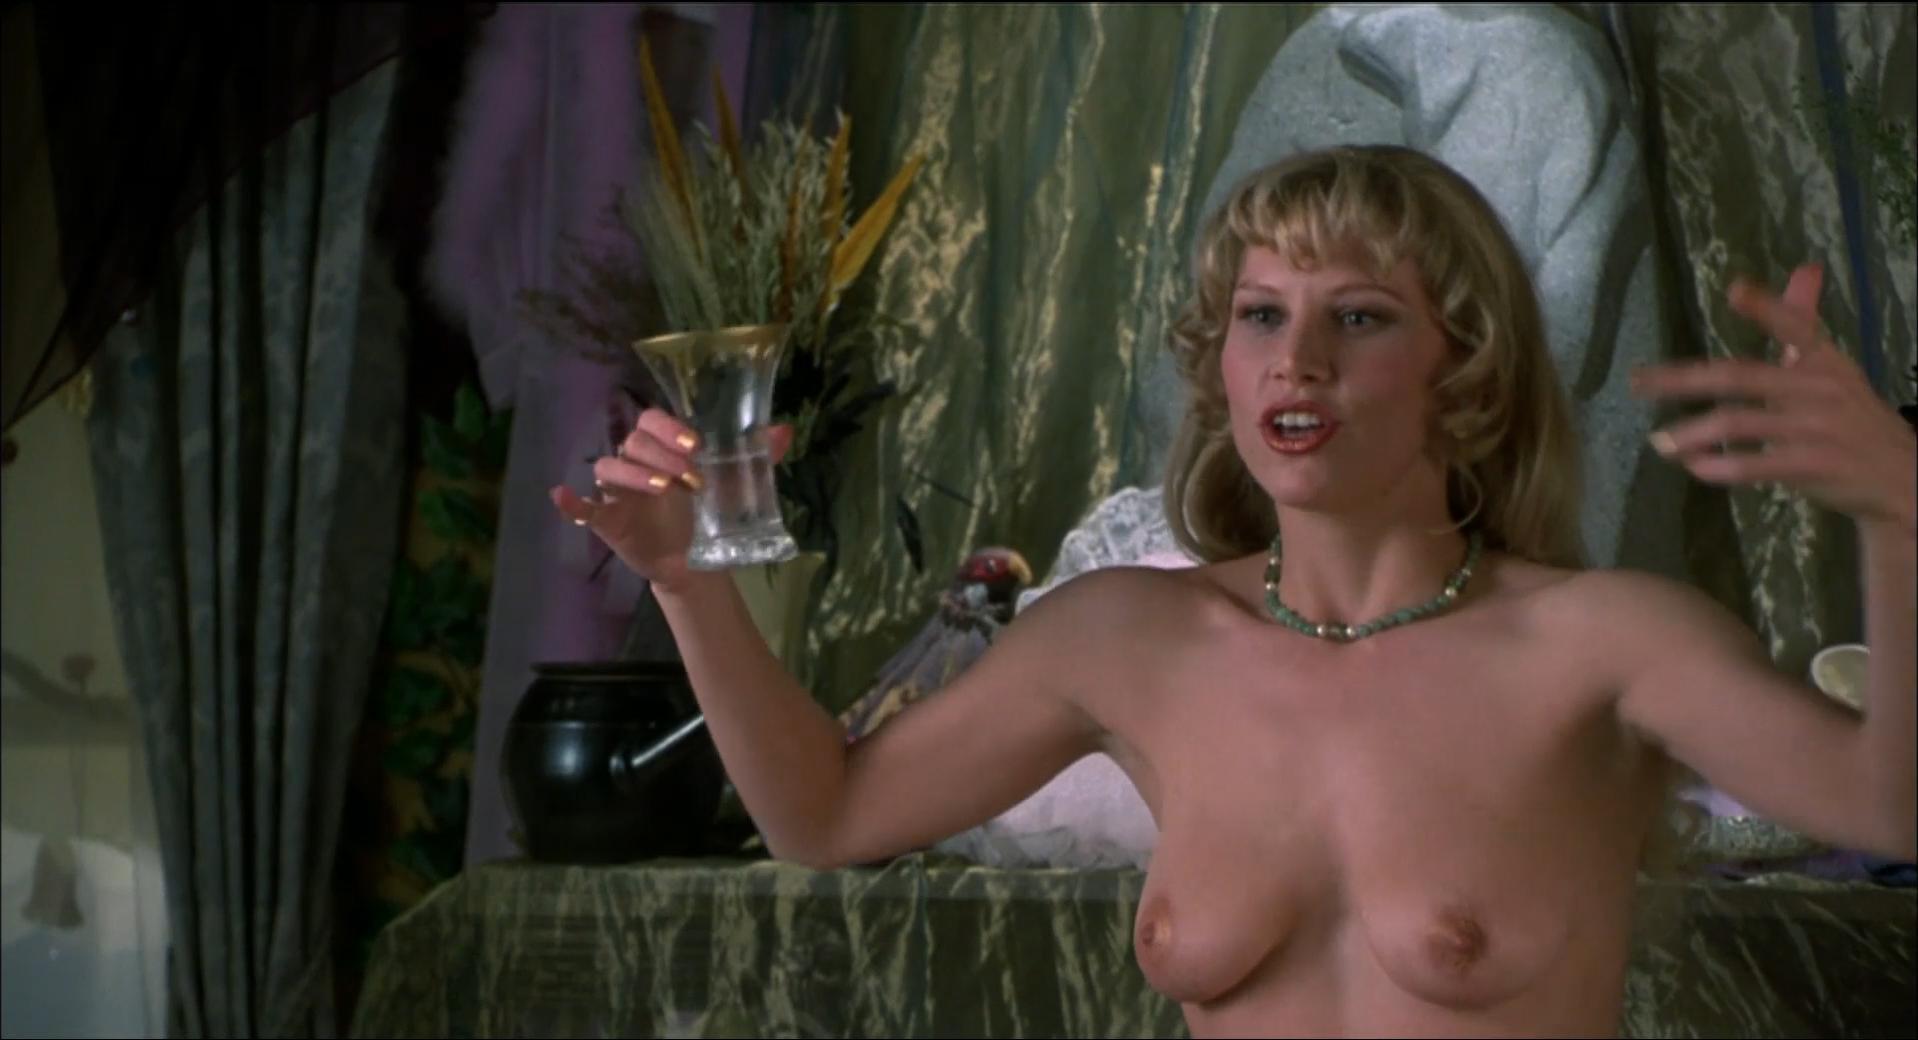 Erotica Laura Anderson nudes (88 photo), Pussy, Cleavage, Feet, underwear 2019